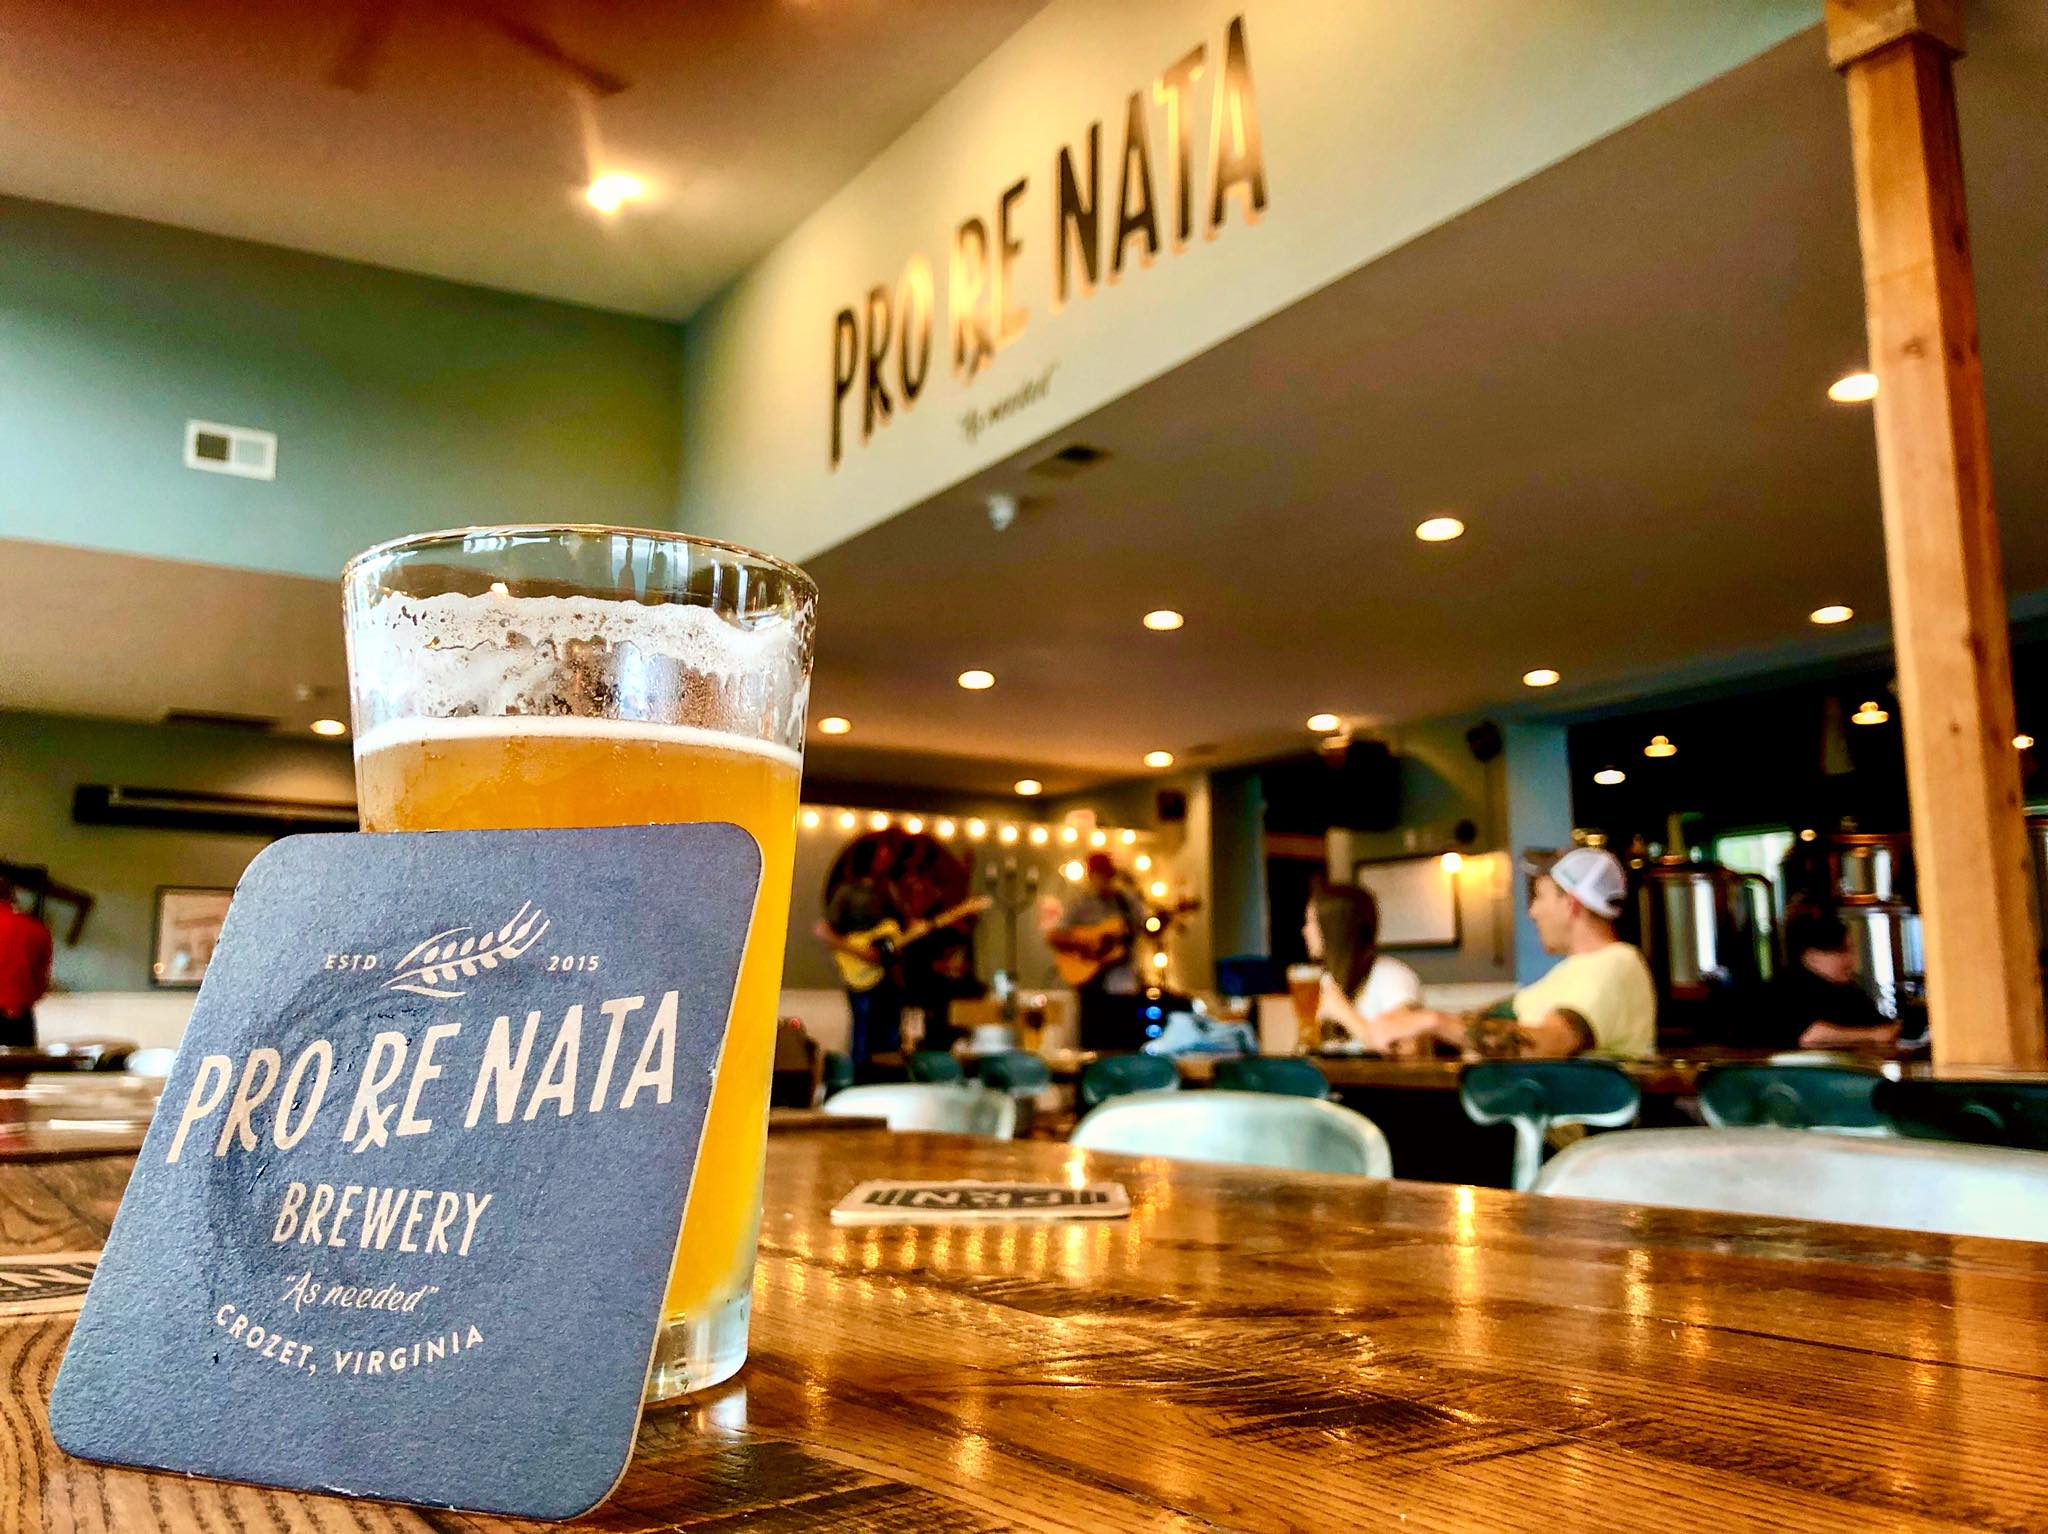 Pro Re Nata Brewery.jpg